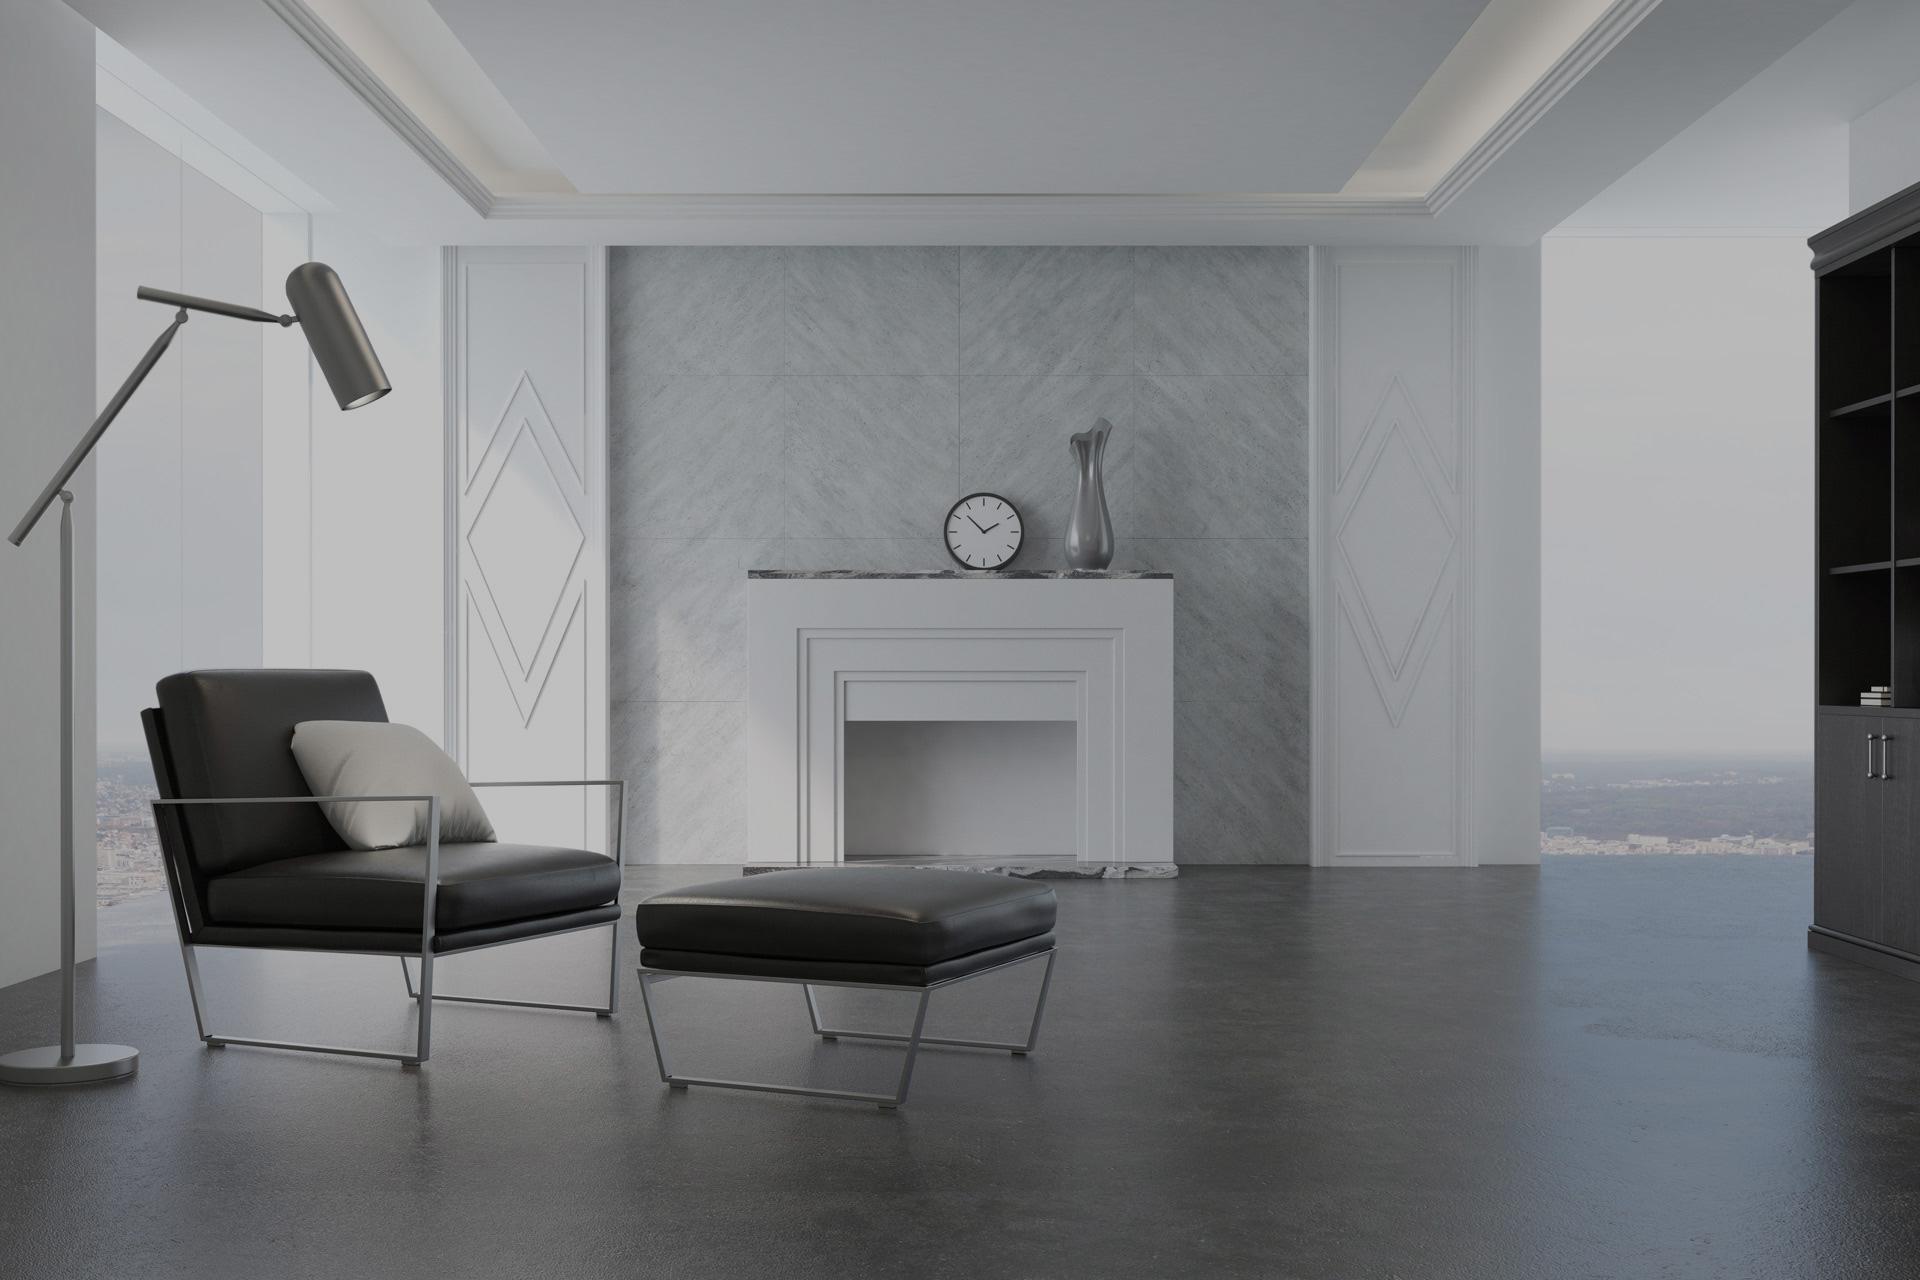 bigstock-Concrete-Living-Room-White-Ar-2181041721